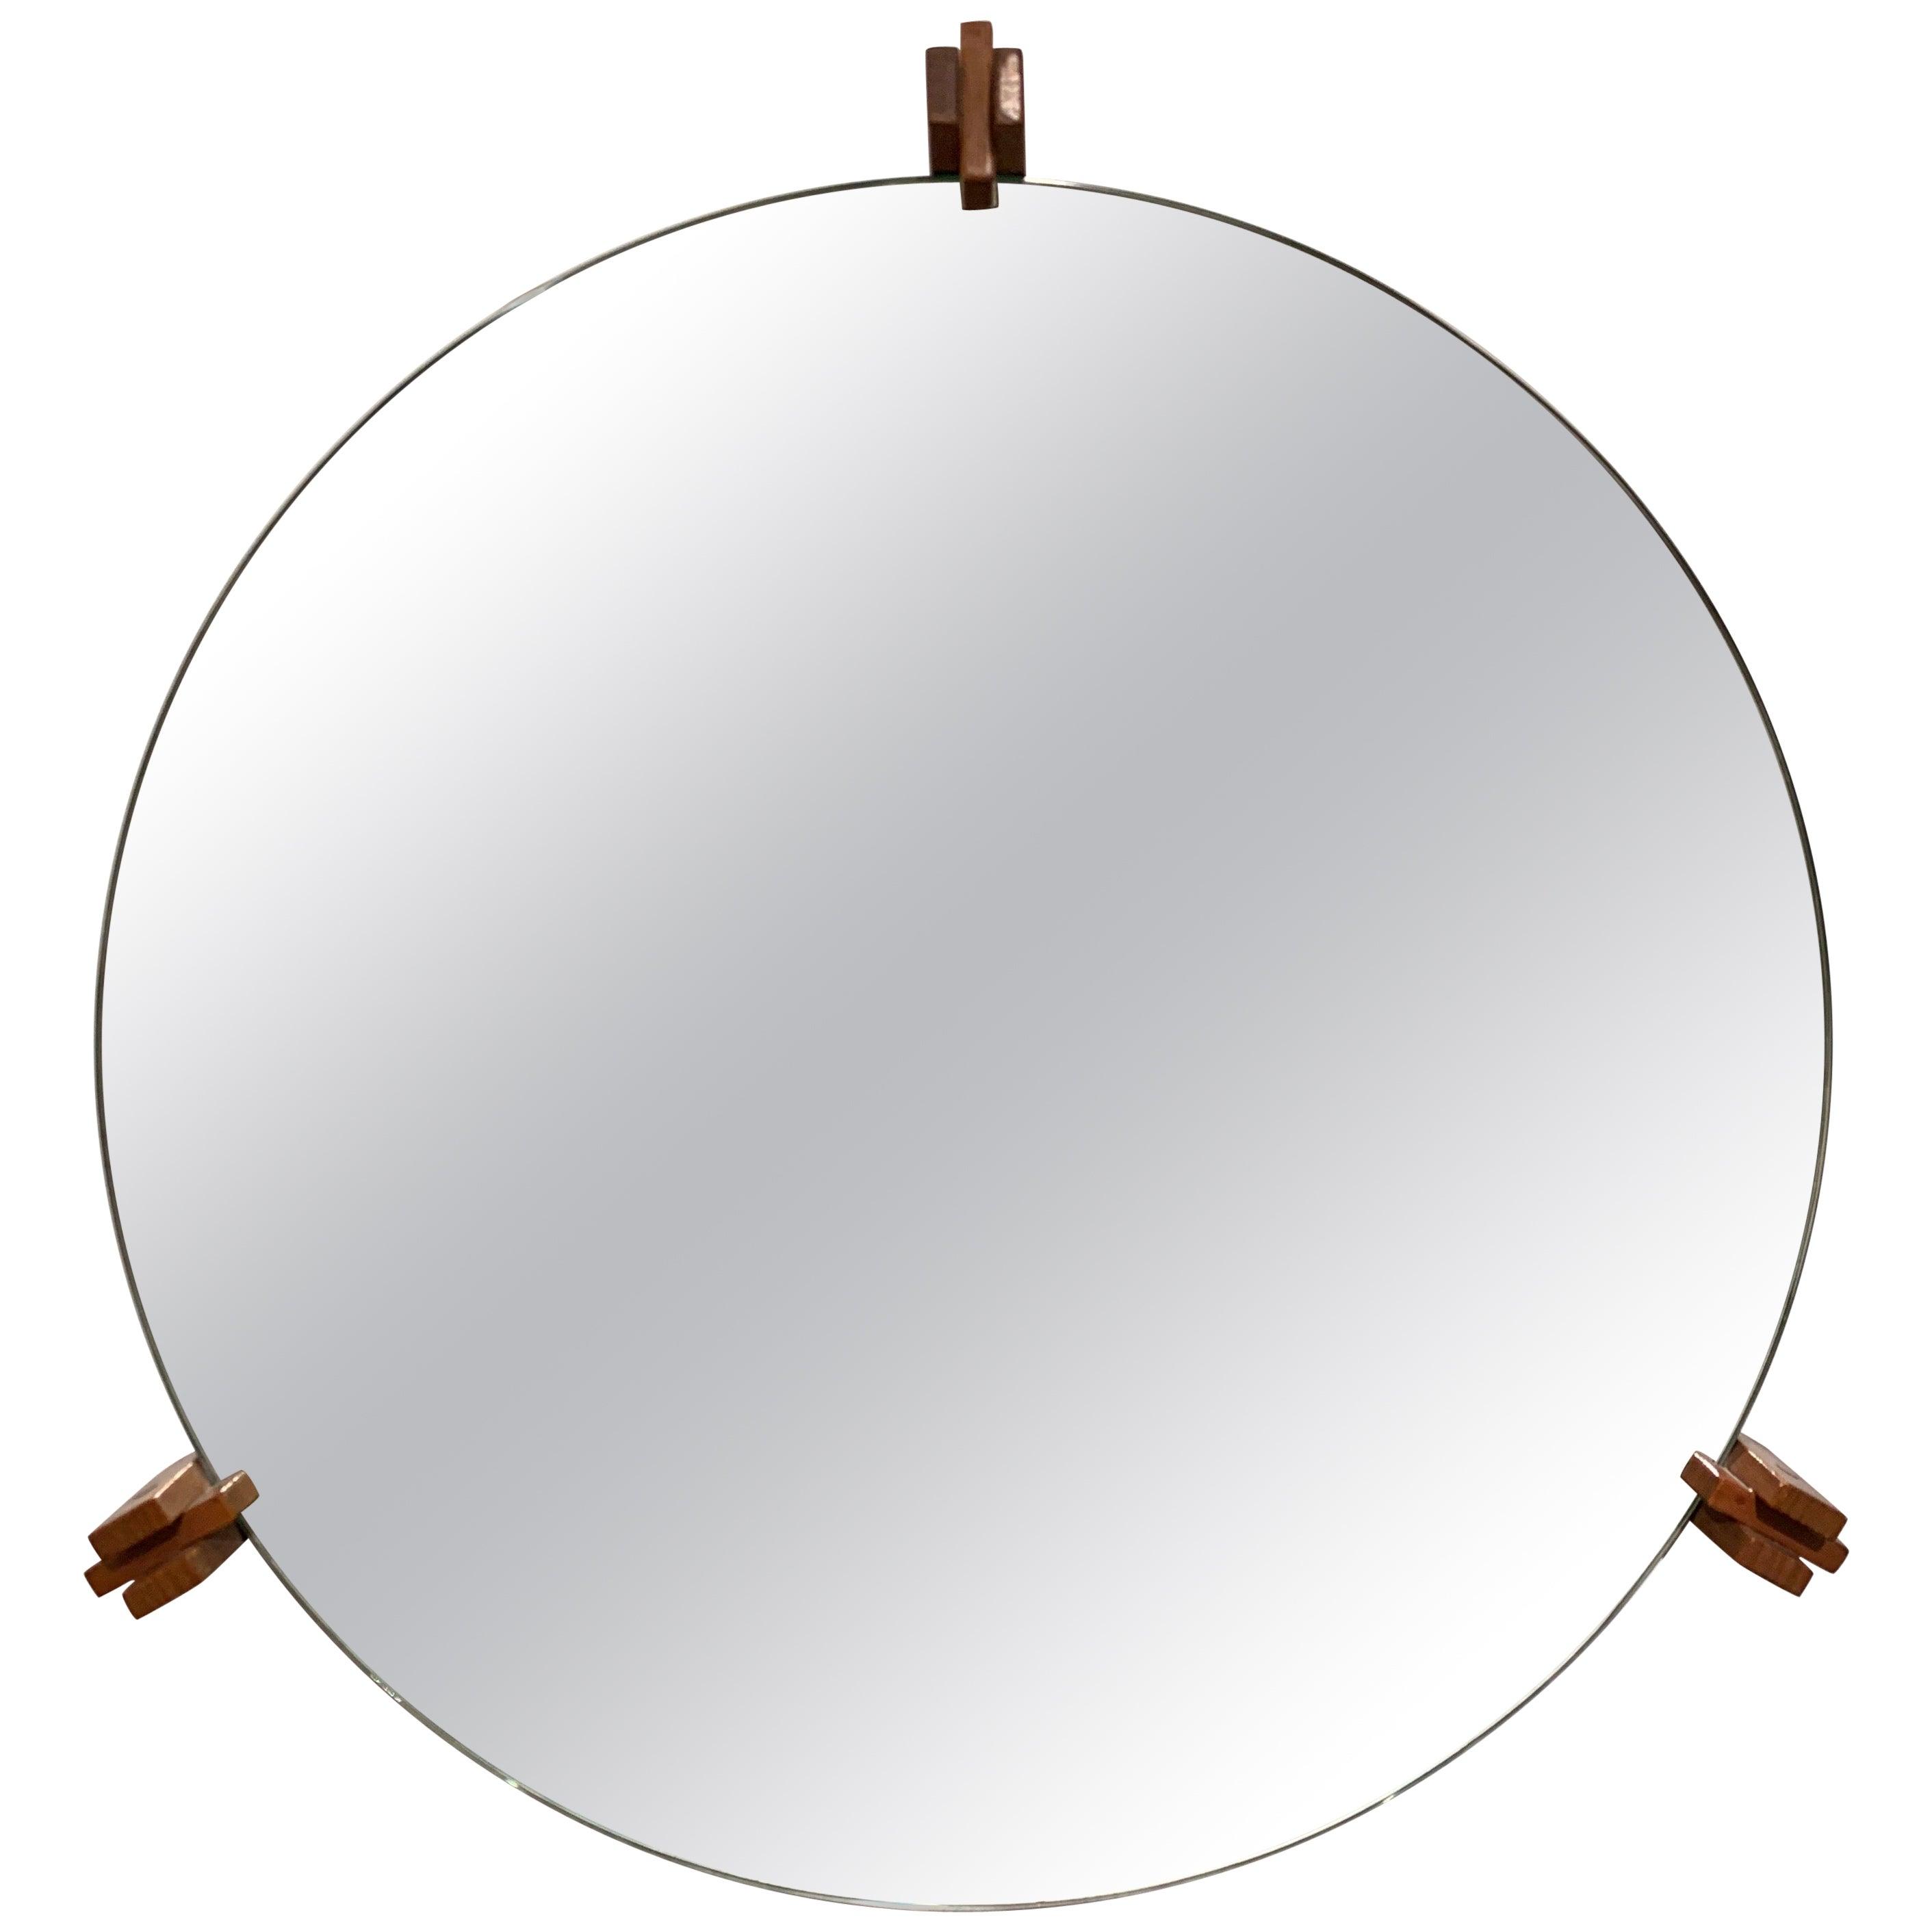 Architectural Italian Wood Mirror, 1960s